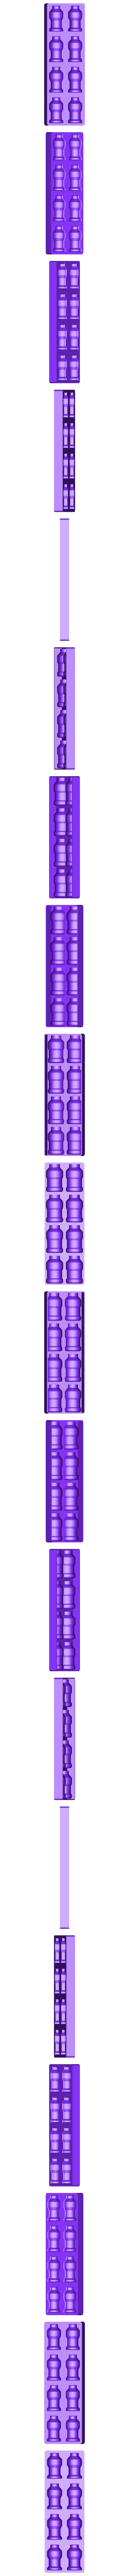 Bottle Ice Tray.stl Download free STL file Bottle Ice tray • 3D printable model, Kraai147